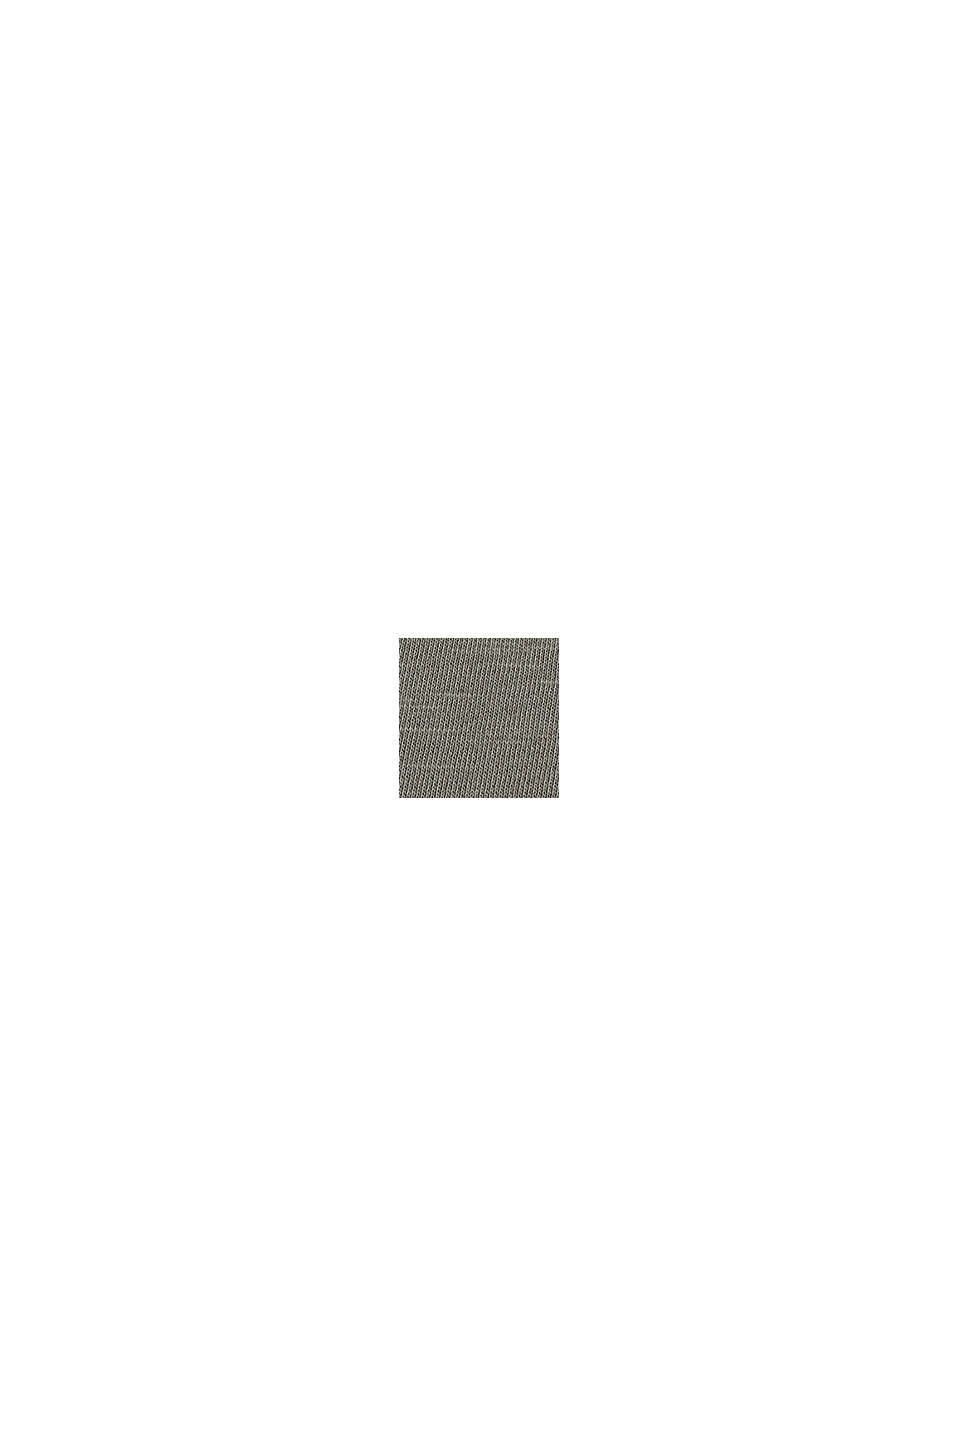 EarthColors®: Baumwoll-Sweatshirt, DARK KHAKI, swatch